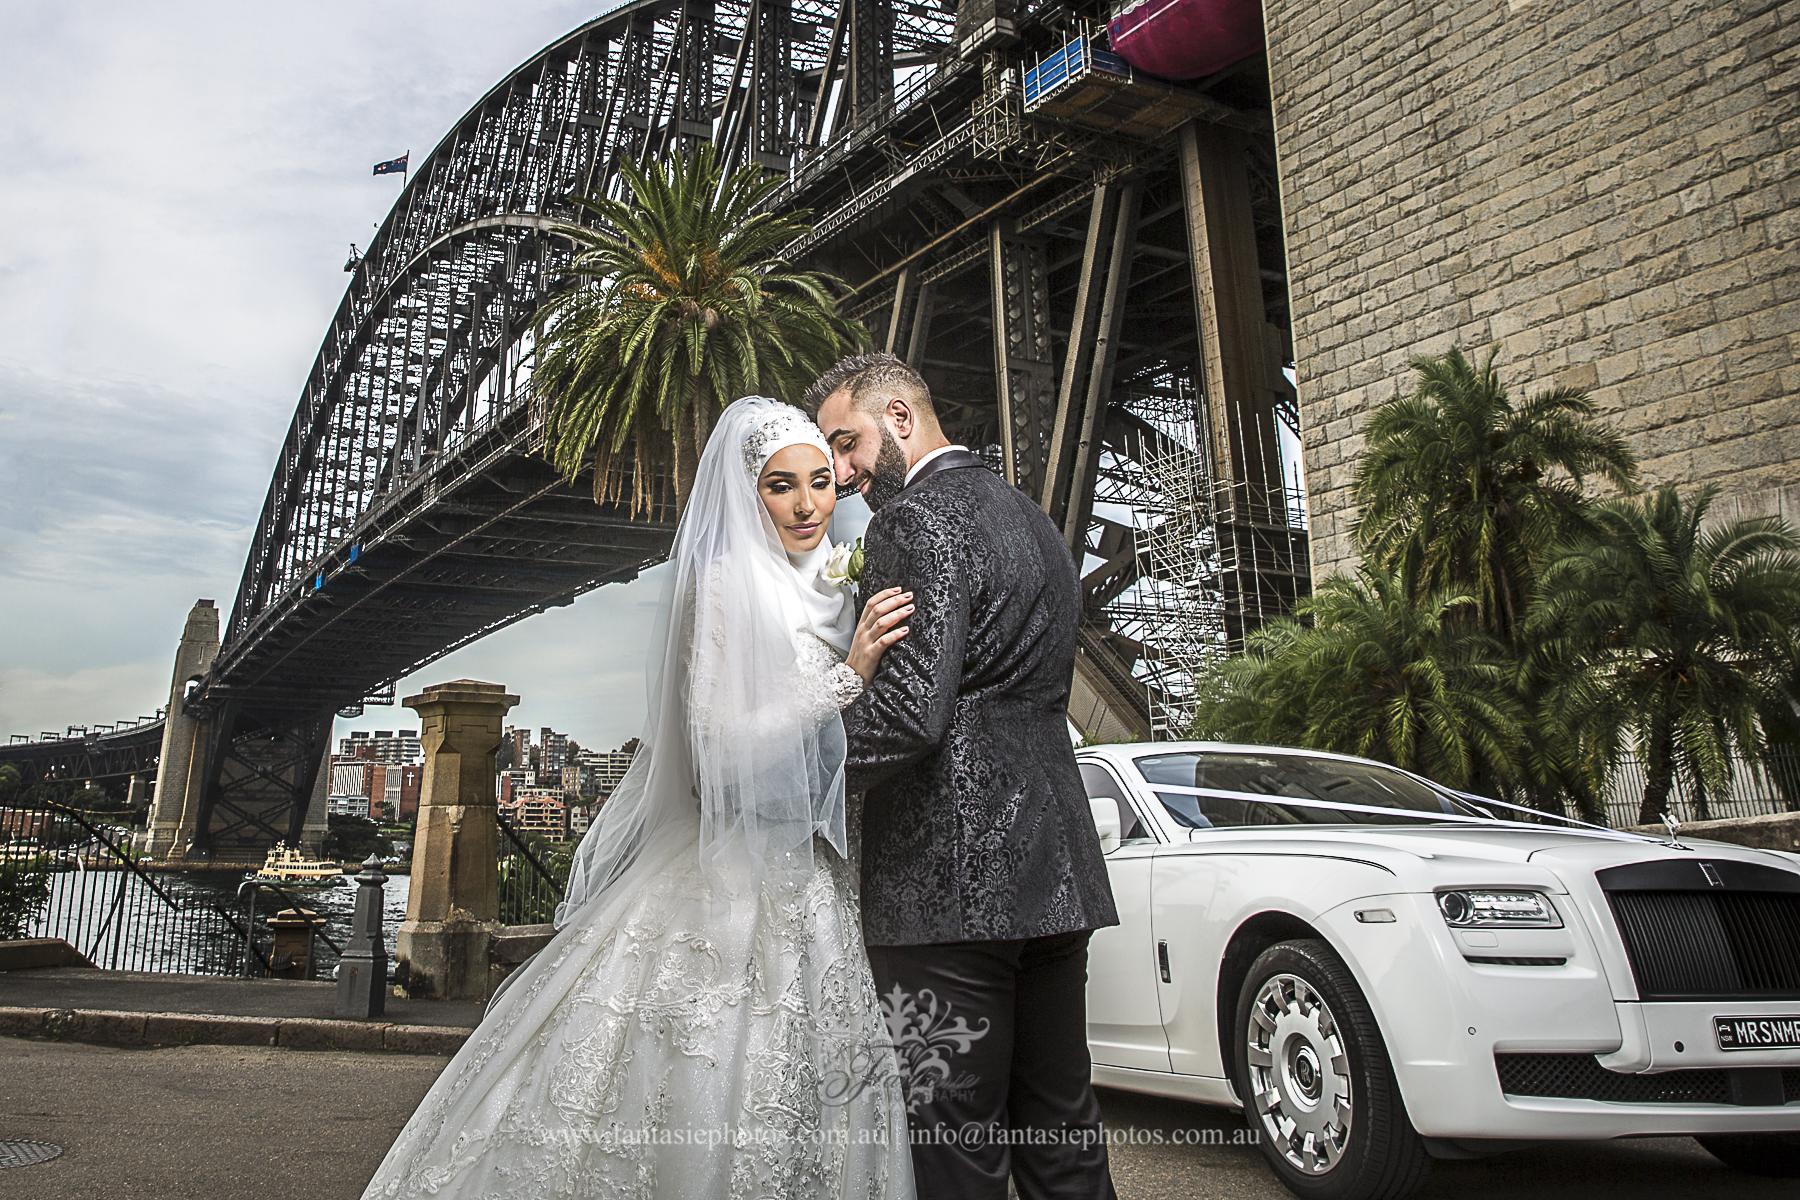 Wedding Photography Sydney Harbour Bridge | Fantasie Photography